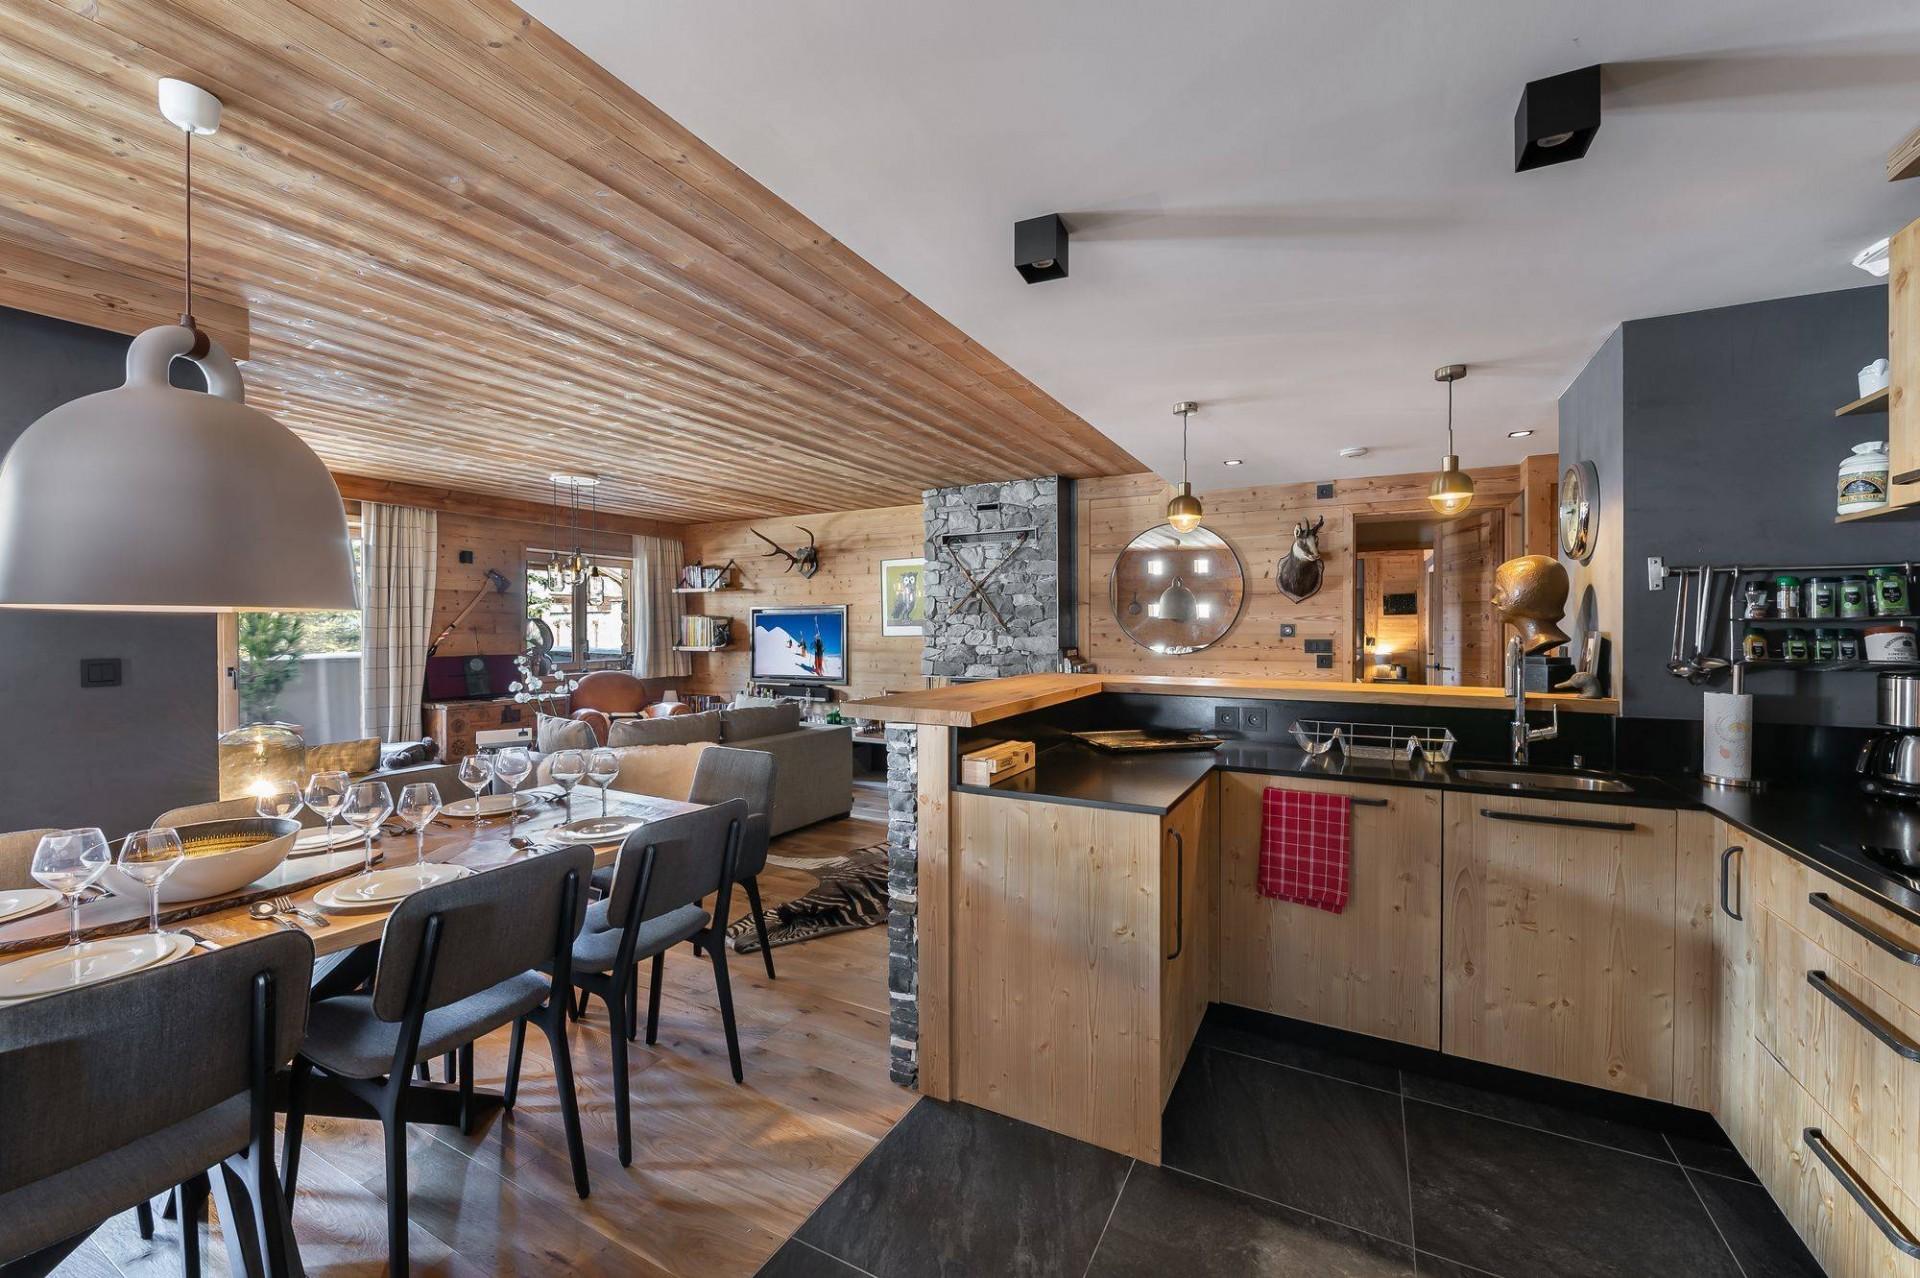 Val d'Isère Location Appartement Luxe Virlonte Salle A Manger 2